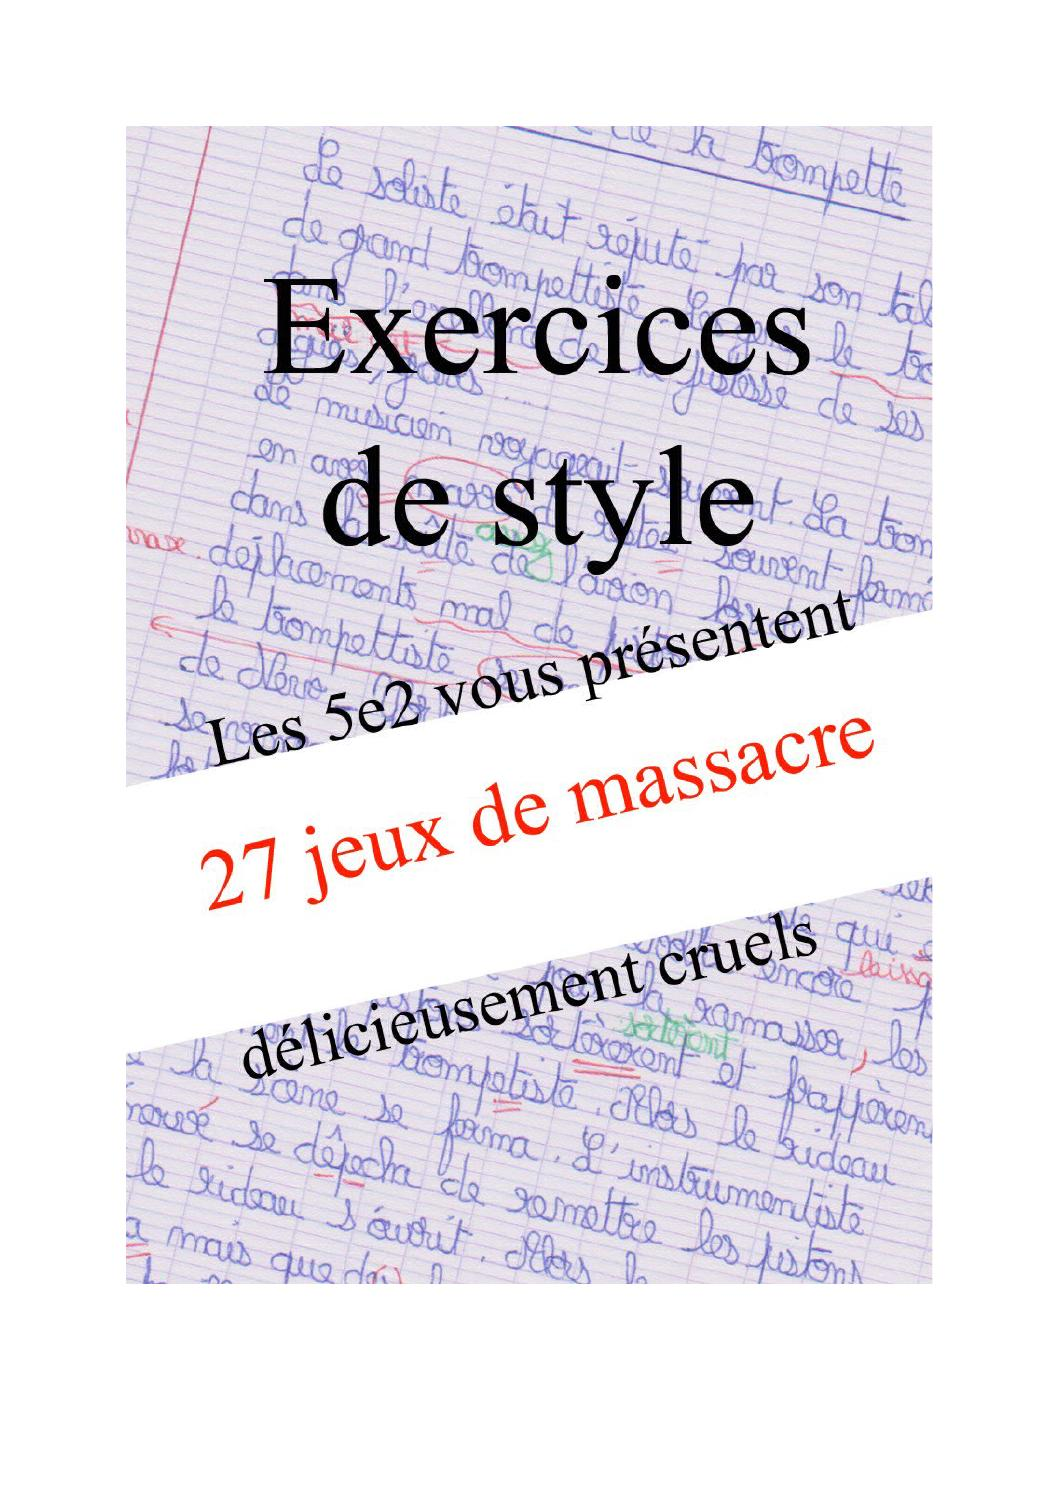 Exercices de style 5e2 by exercices de style - Issuu